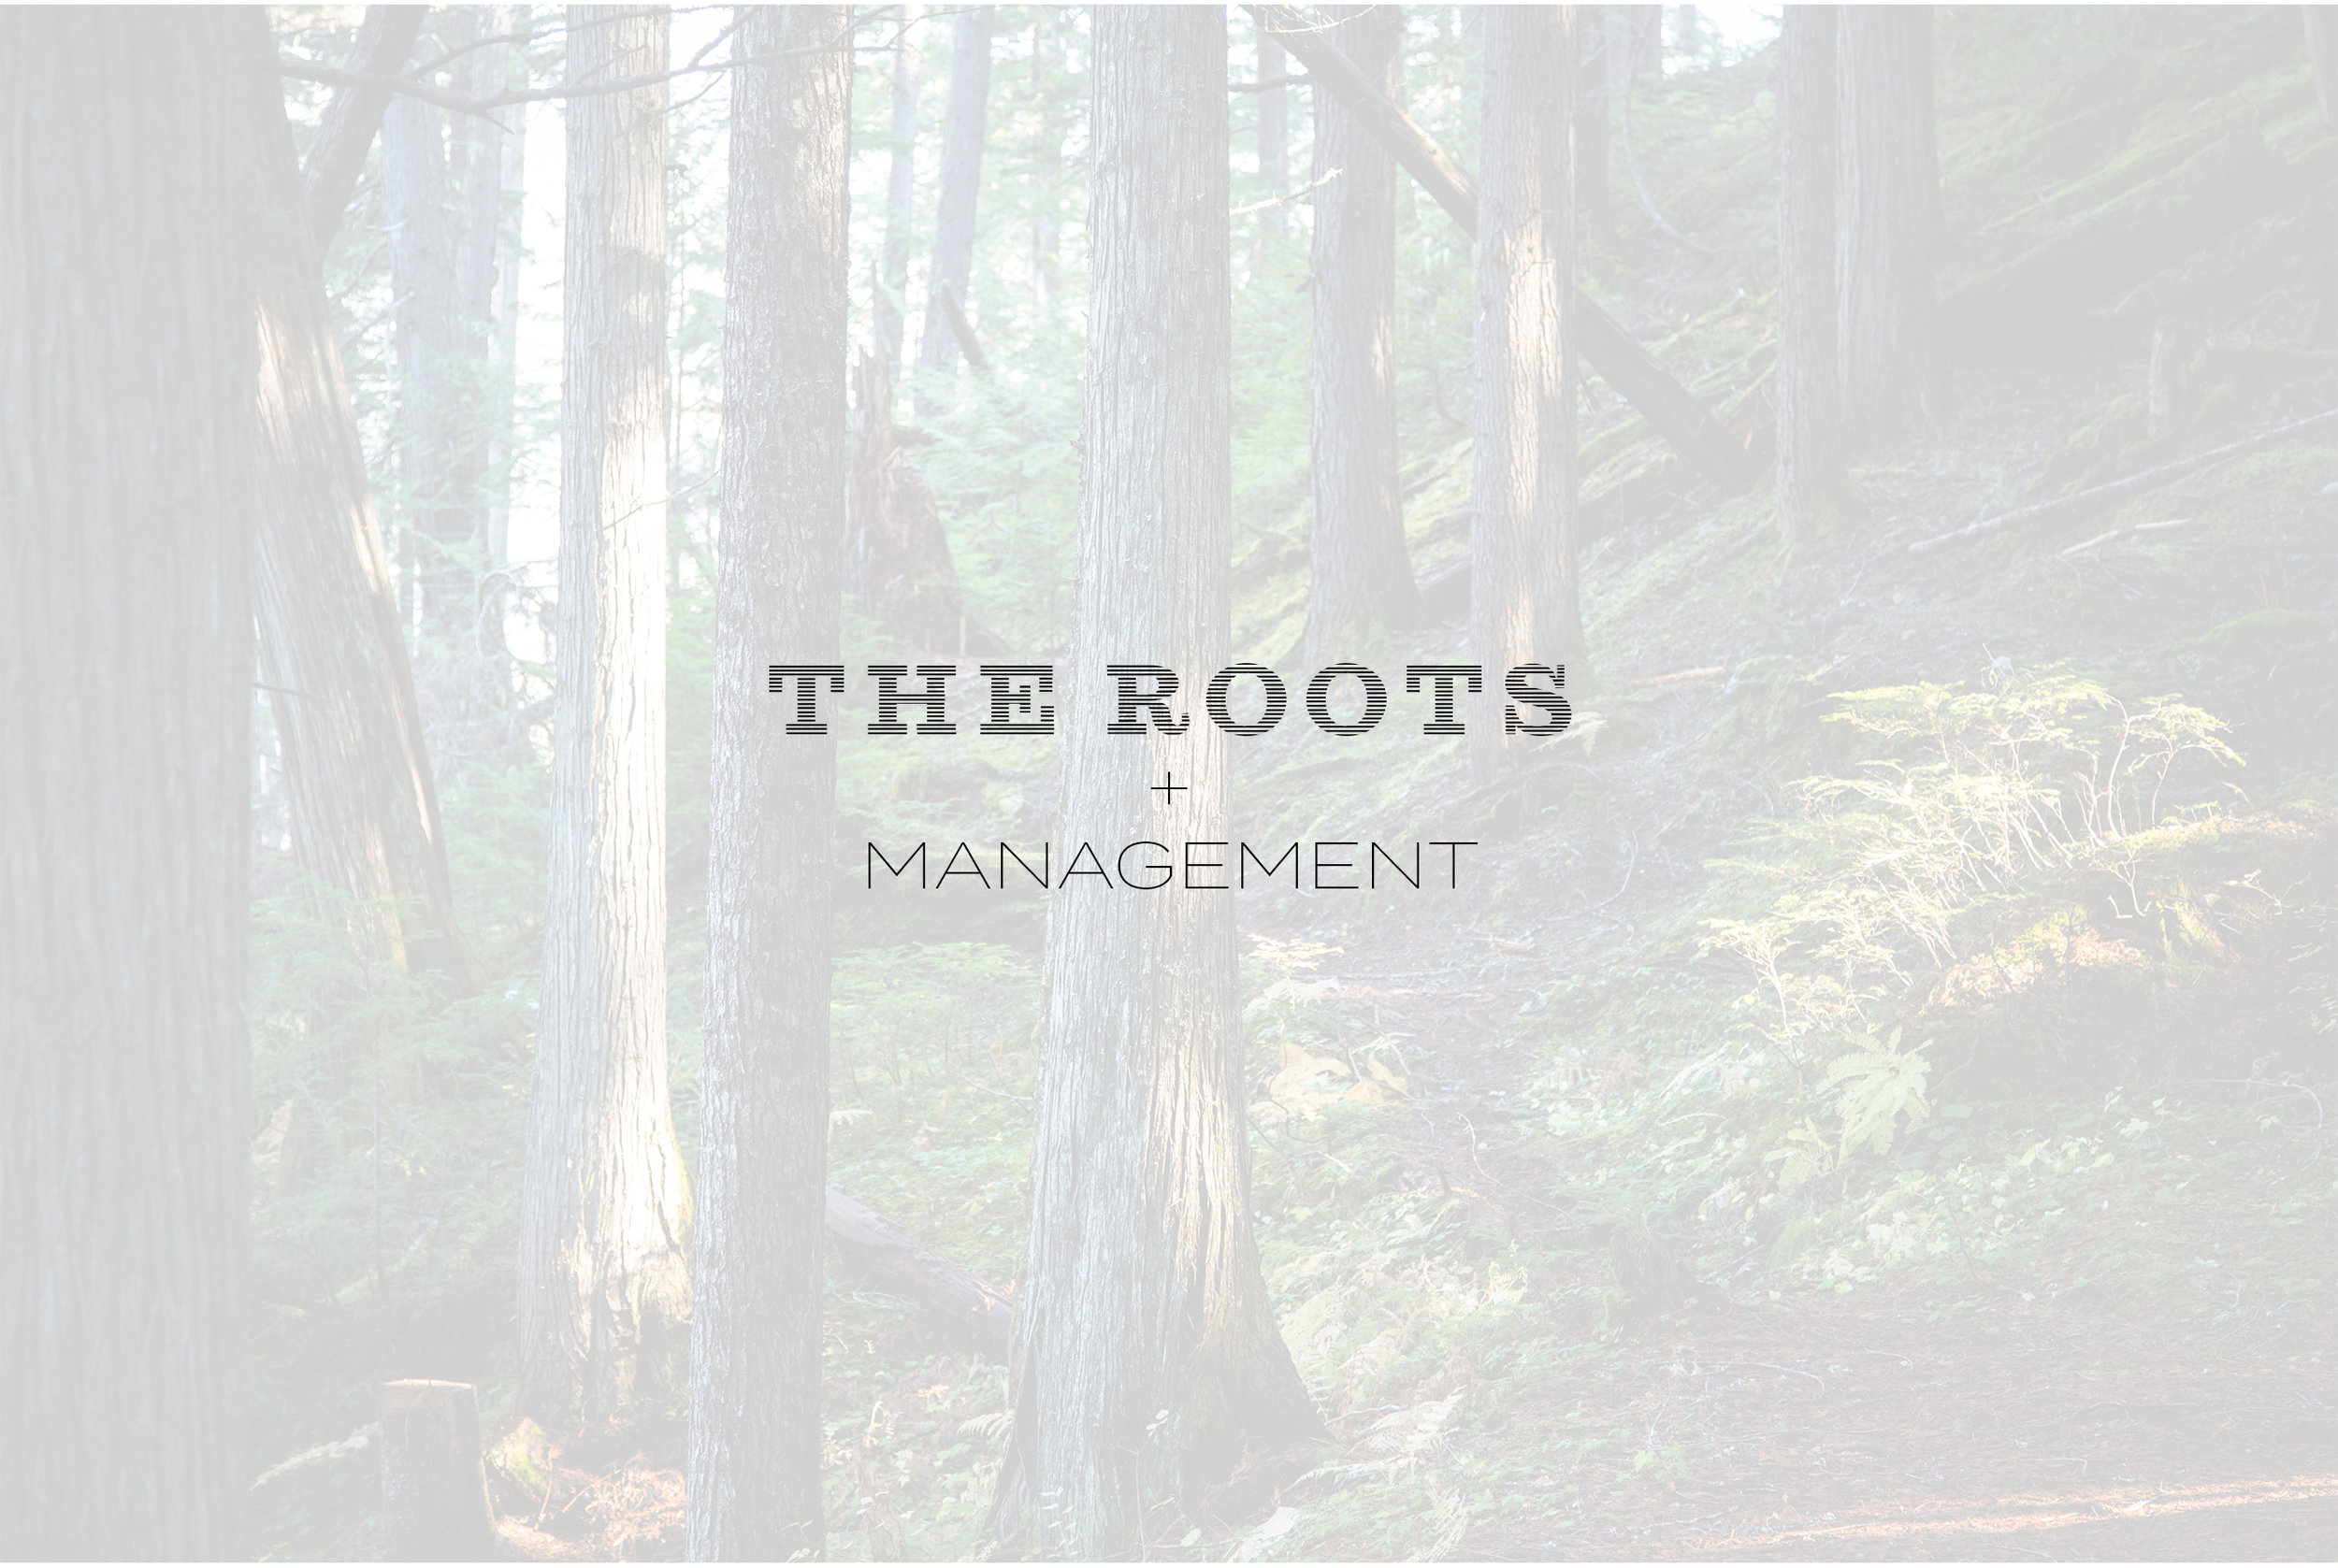 Roots+Management.jpg